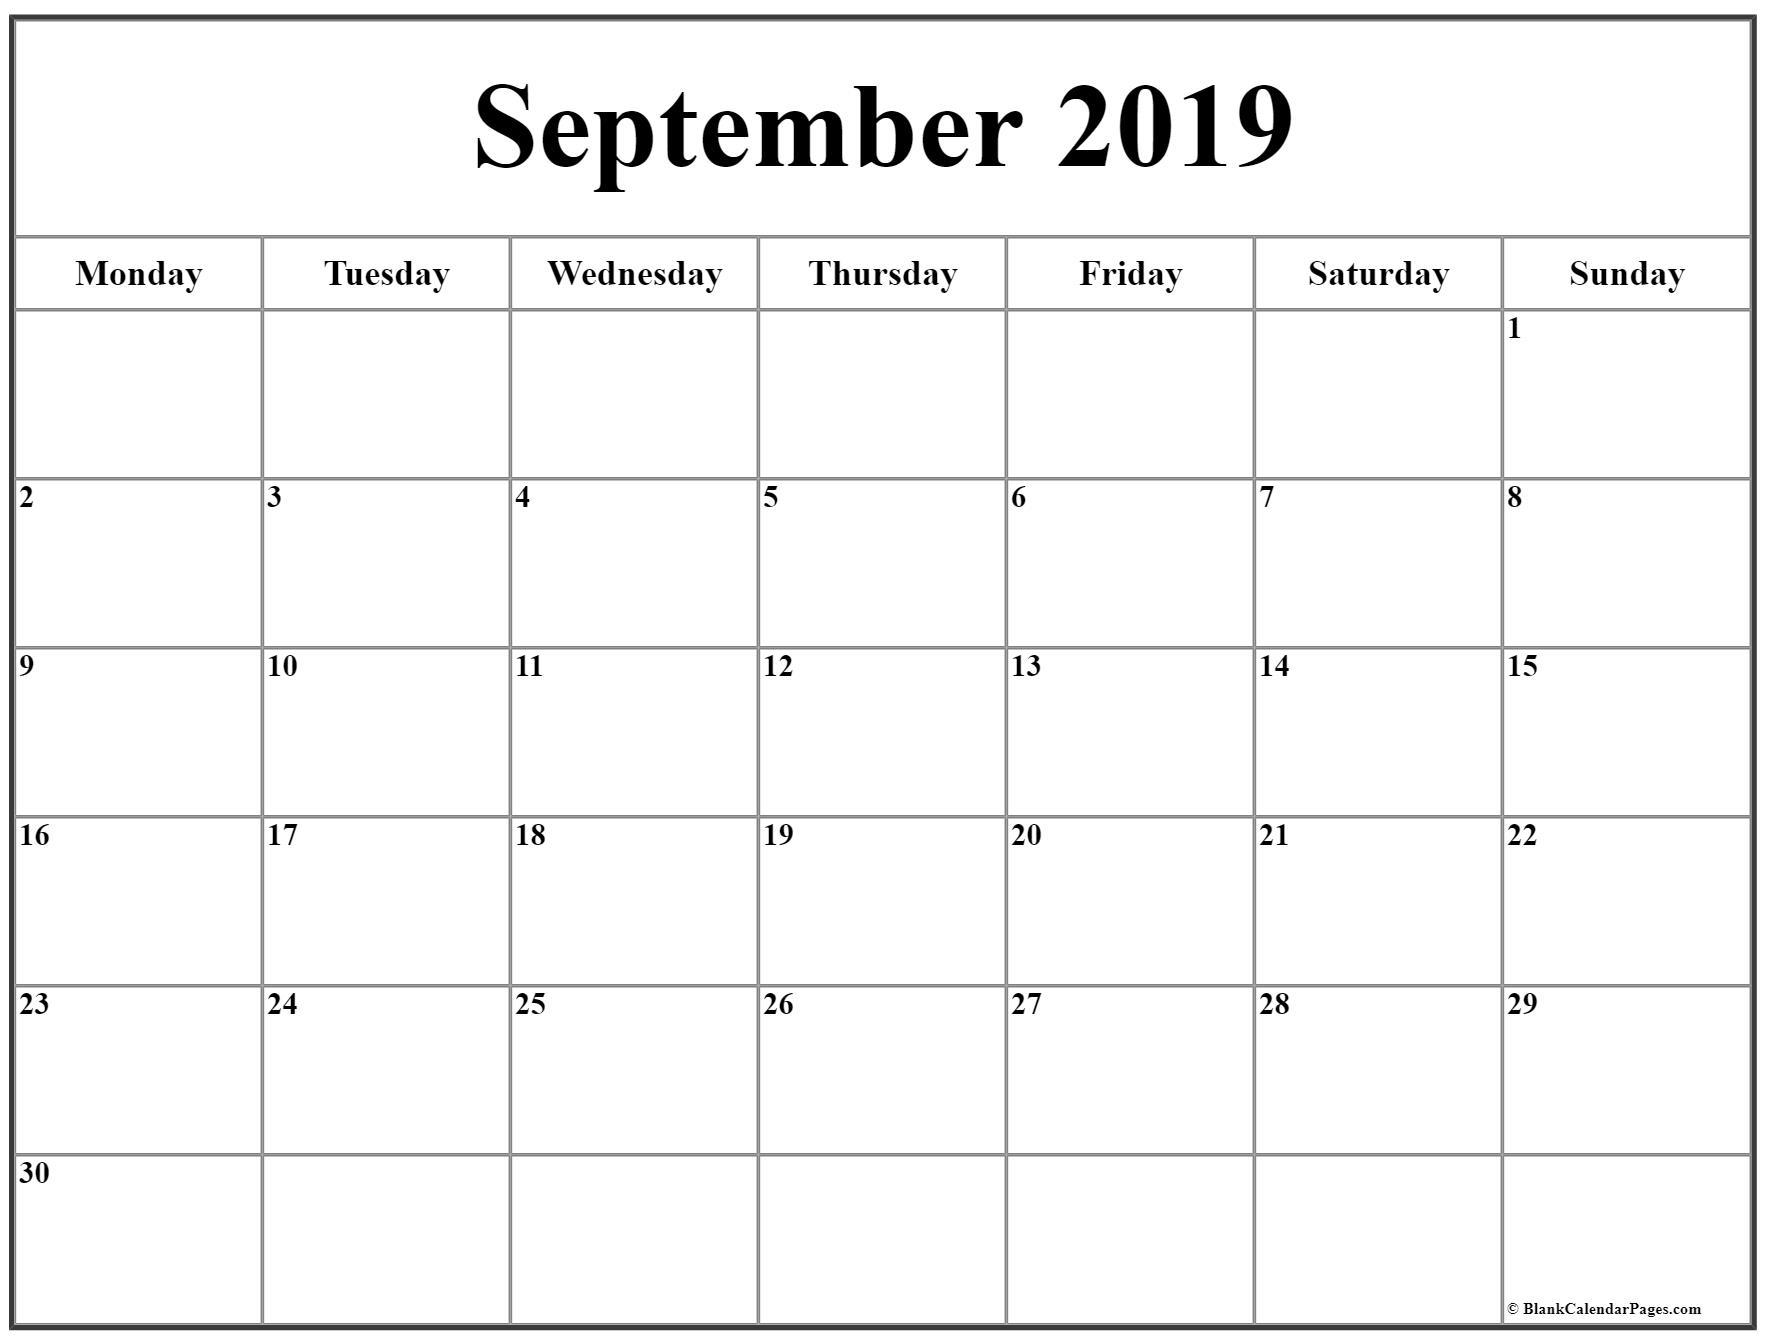 September 2019 Monday Calendar   Monday To Sunday